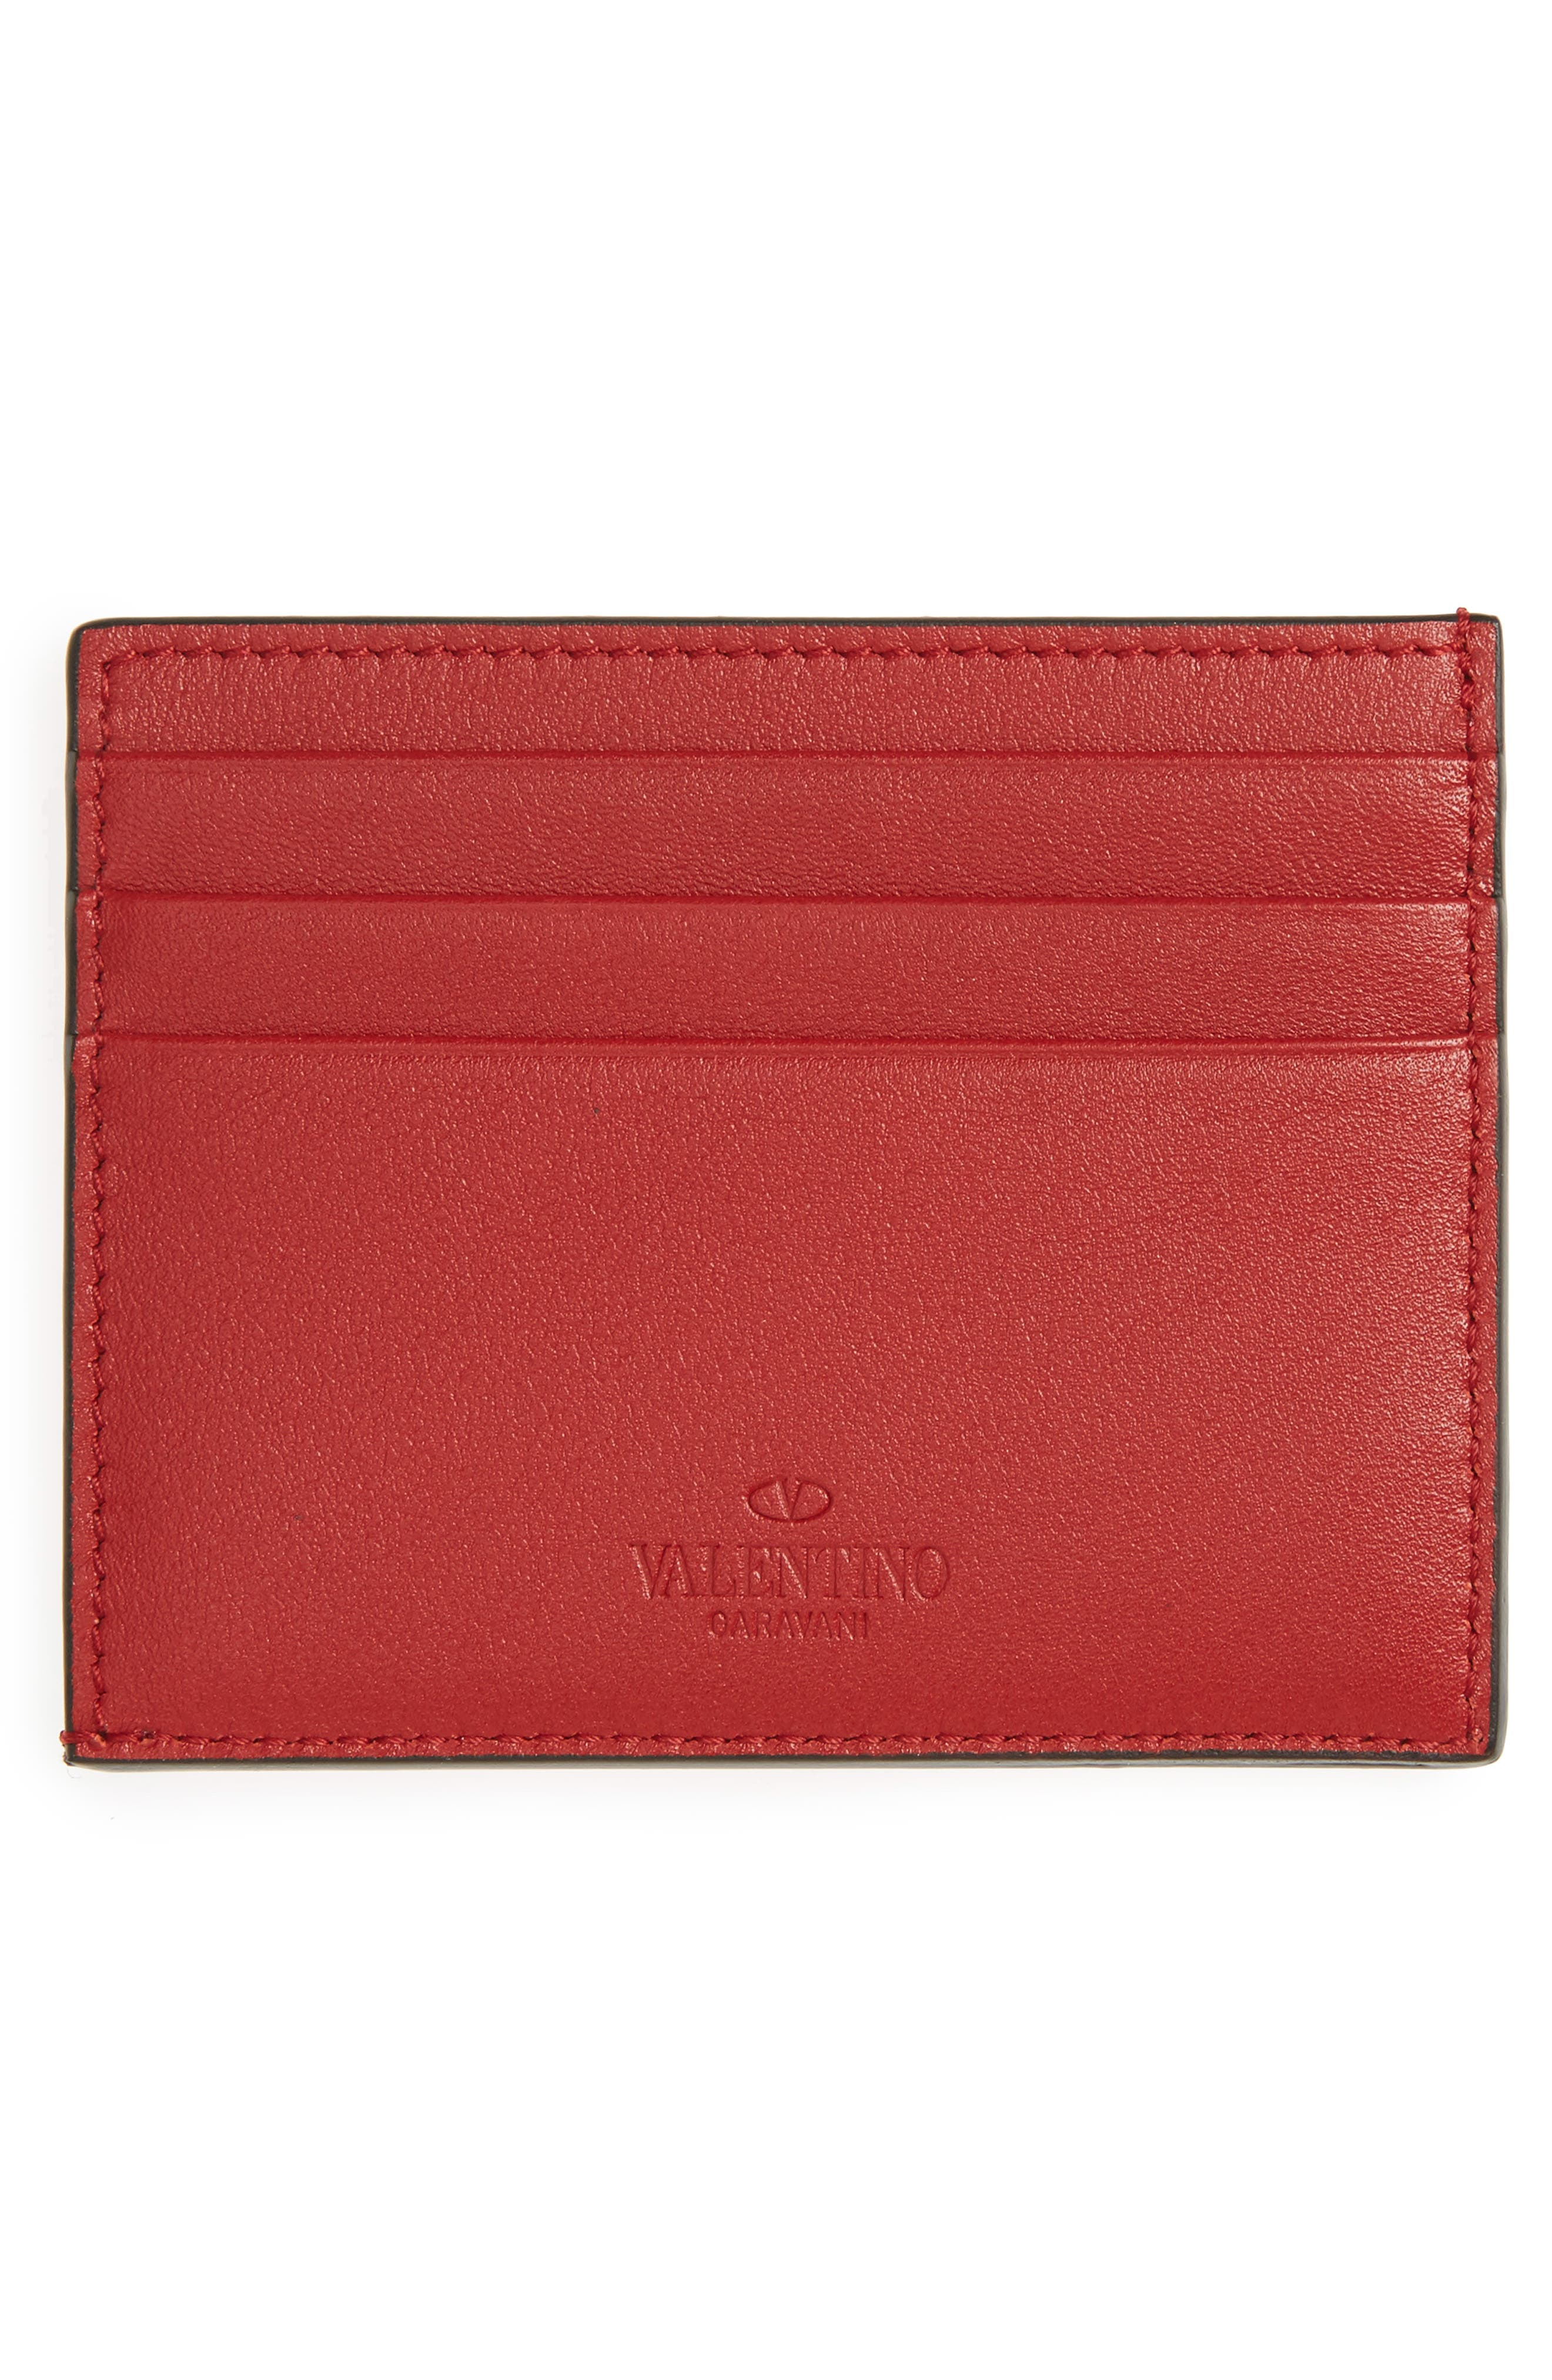 GARAVANI Mini Rock Stud Leather Card Case,                             Alternate thumbnail 2, color,                             Red